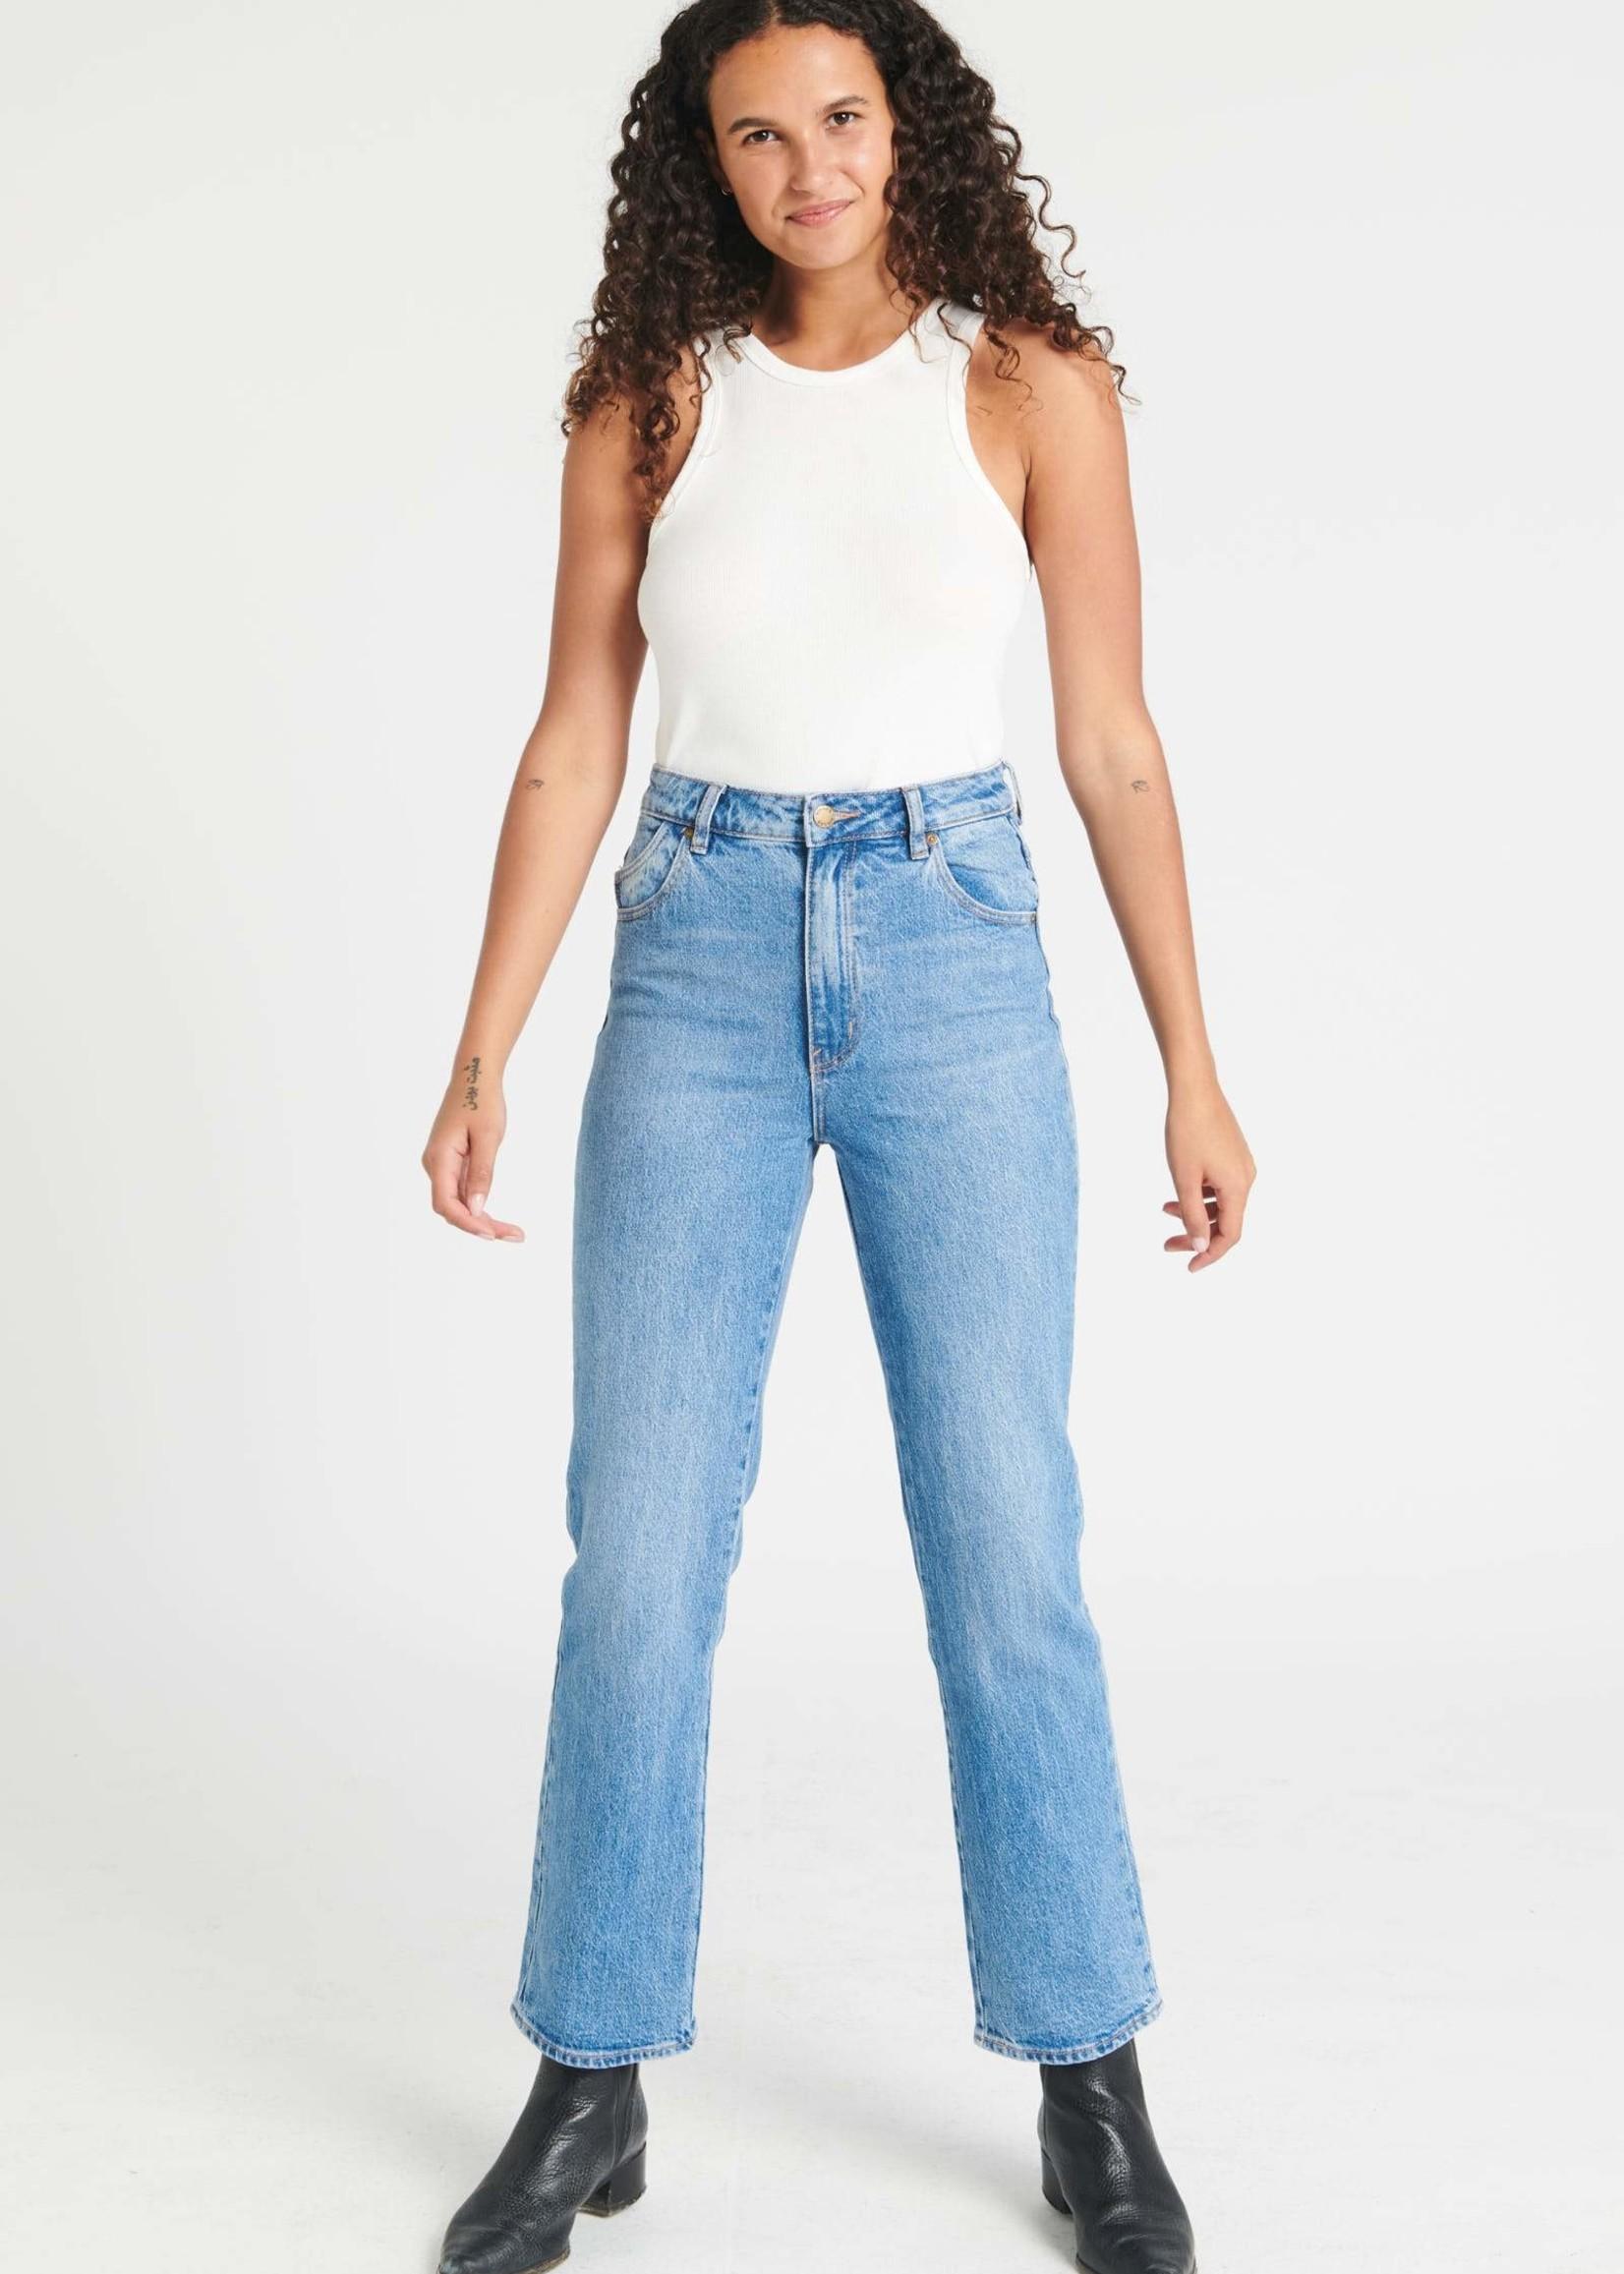 rollas rollas original straight jean